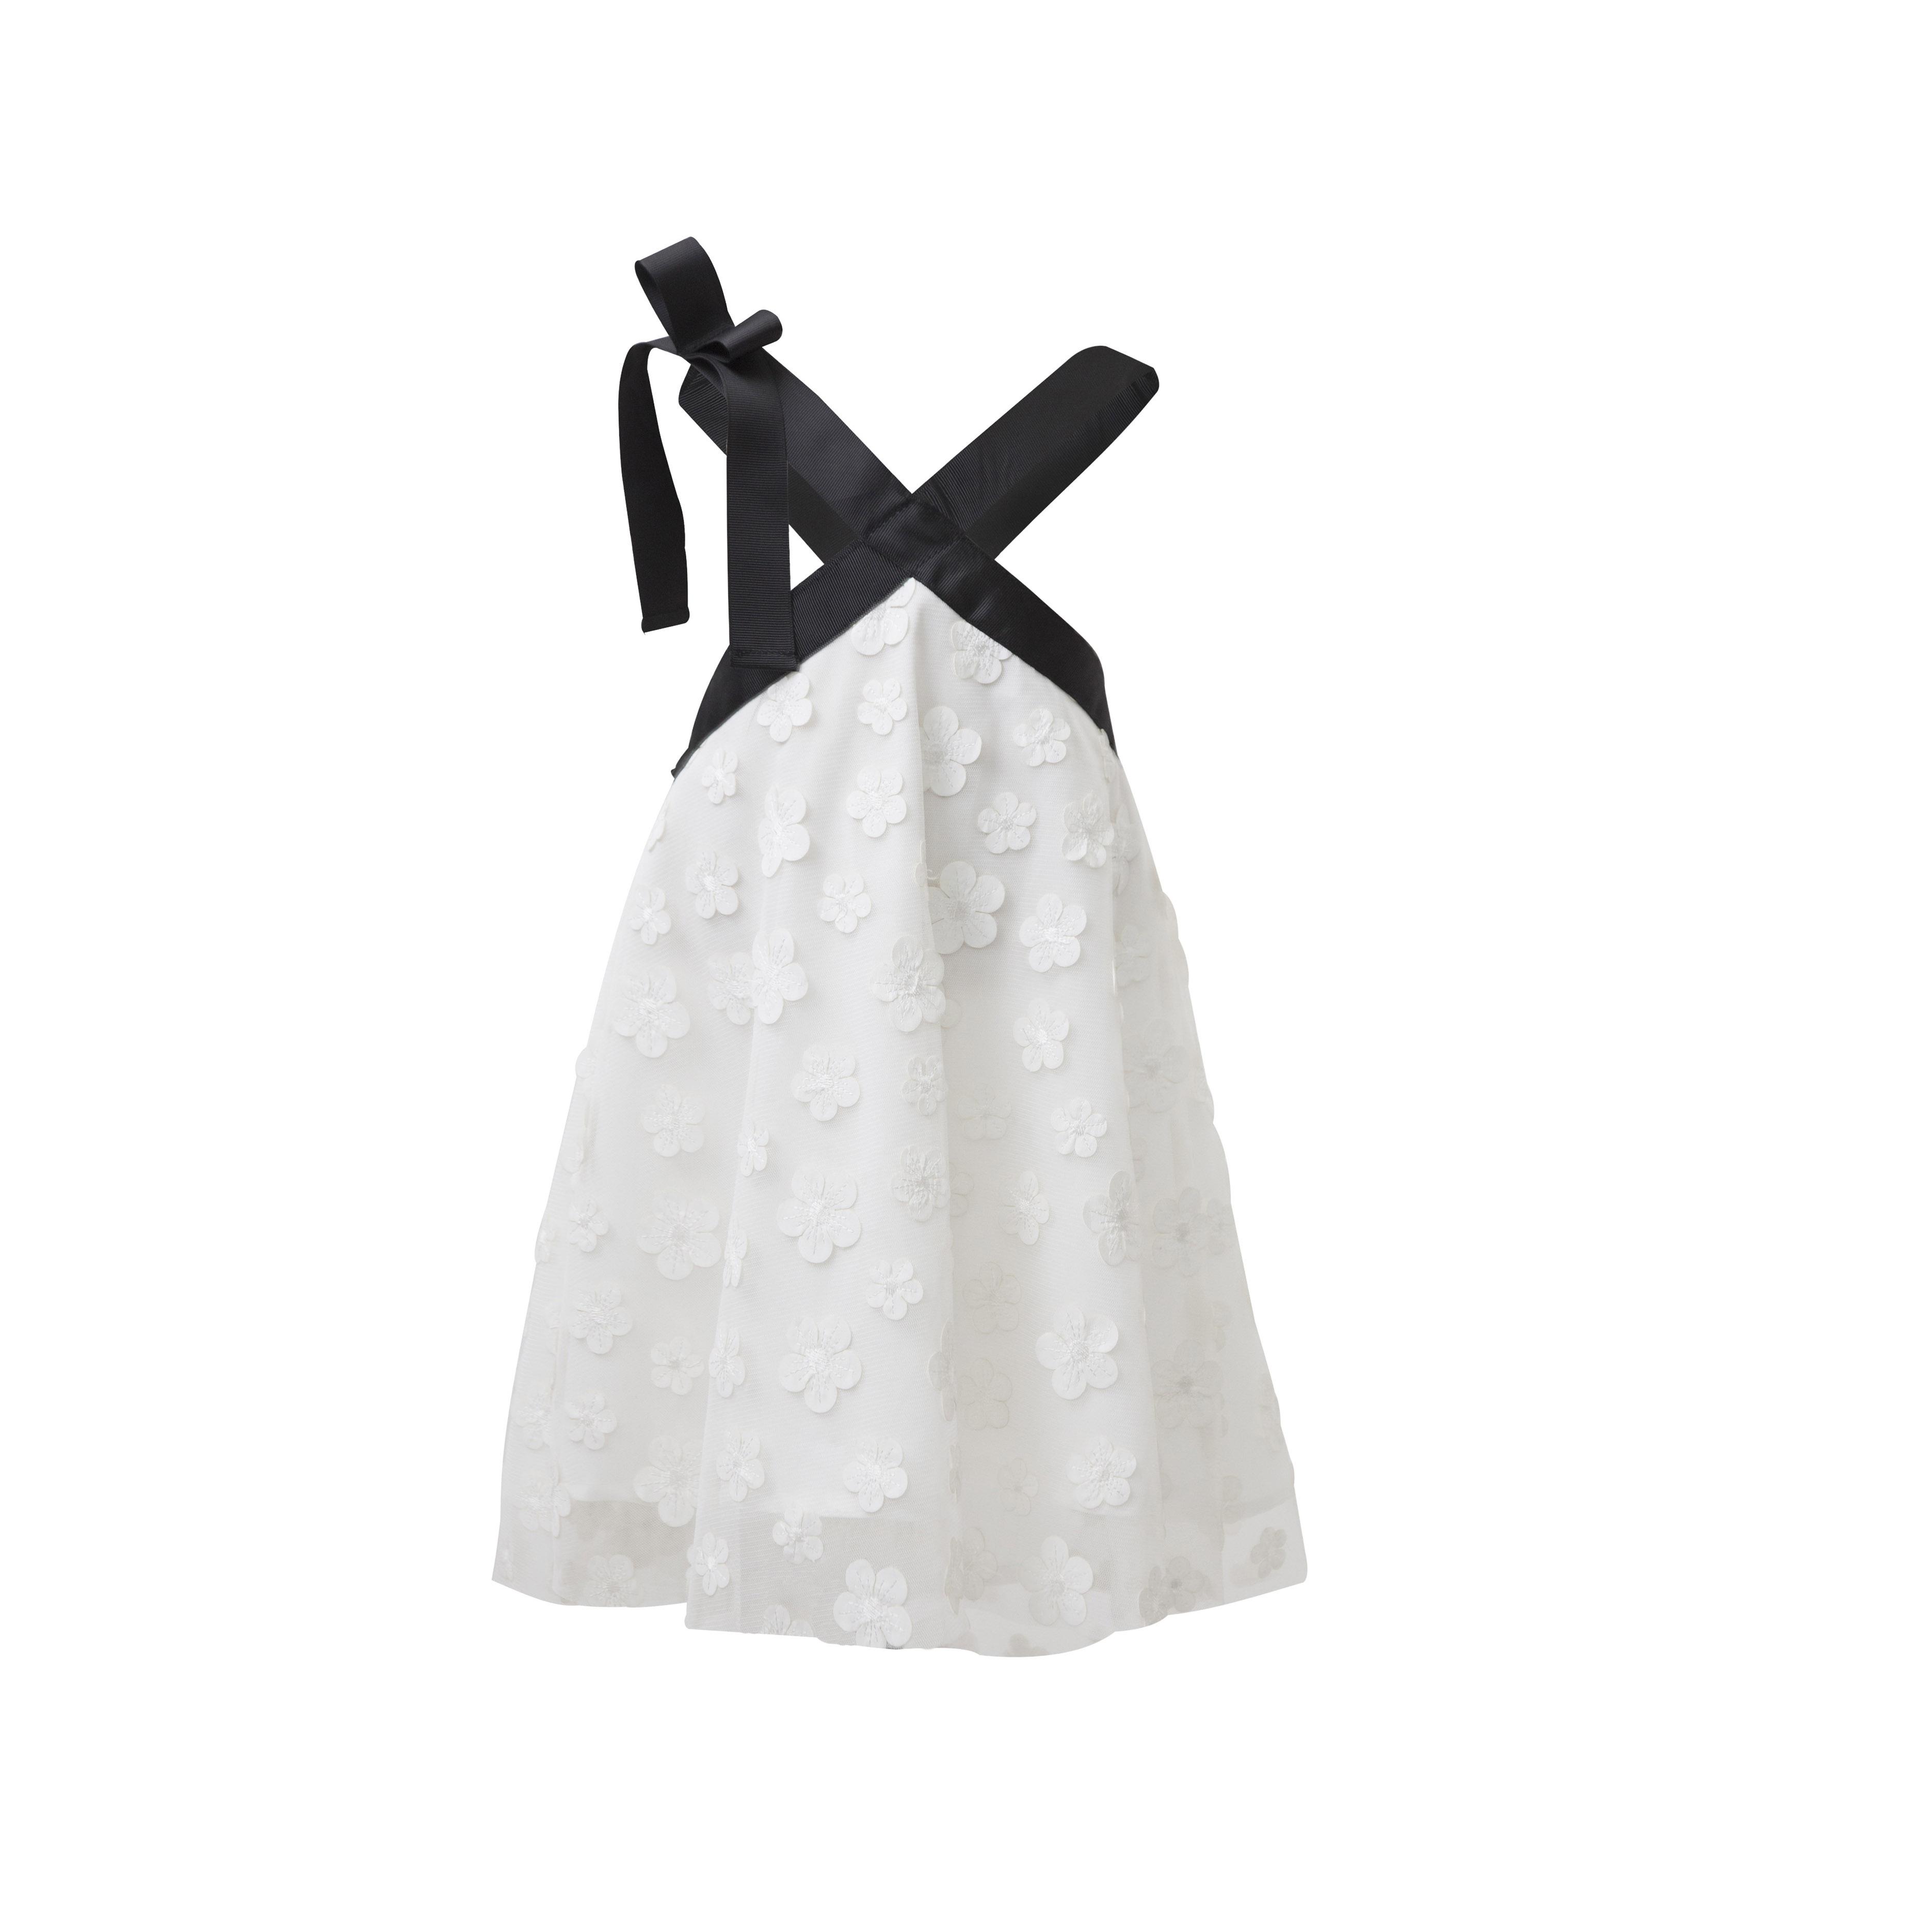 dd7721693a11 Φόρεμα λευκό με μαργαρίτες και τούλι | Baby Love Kalamata